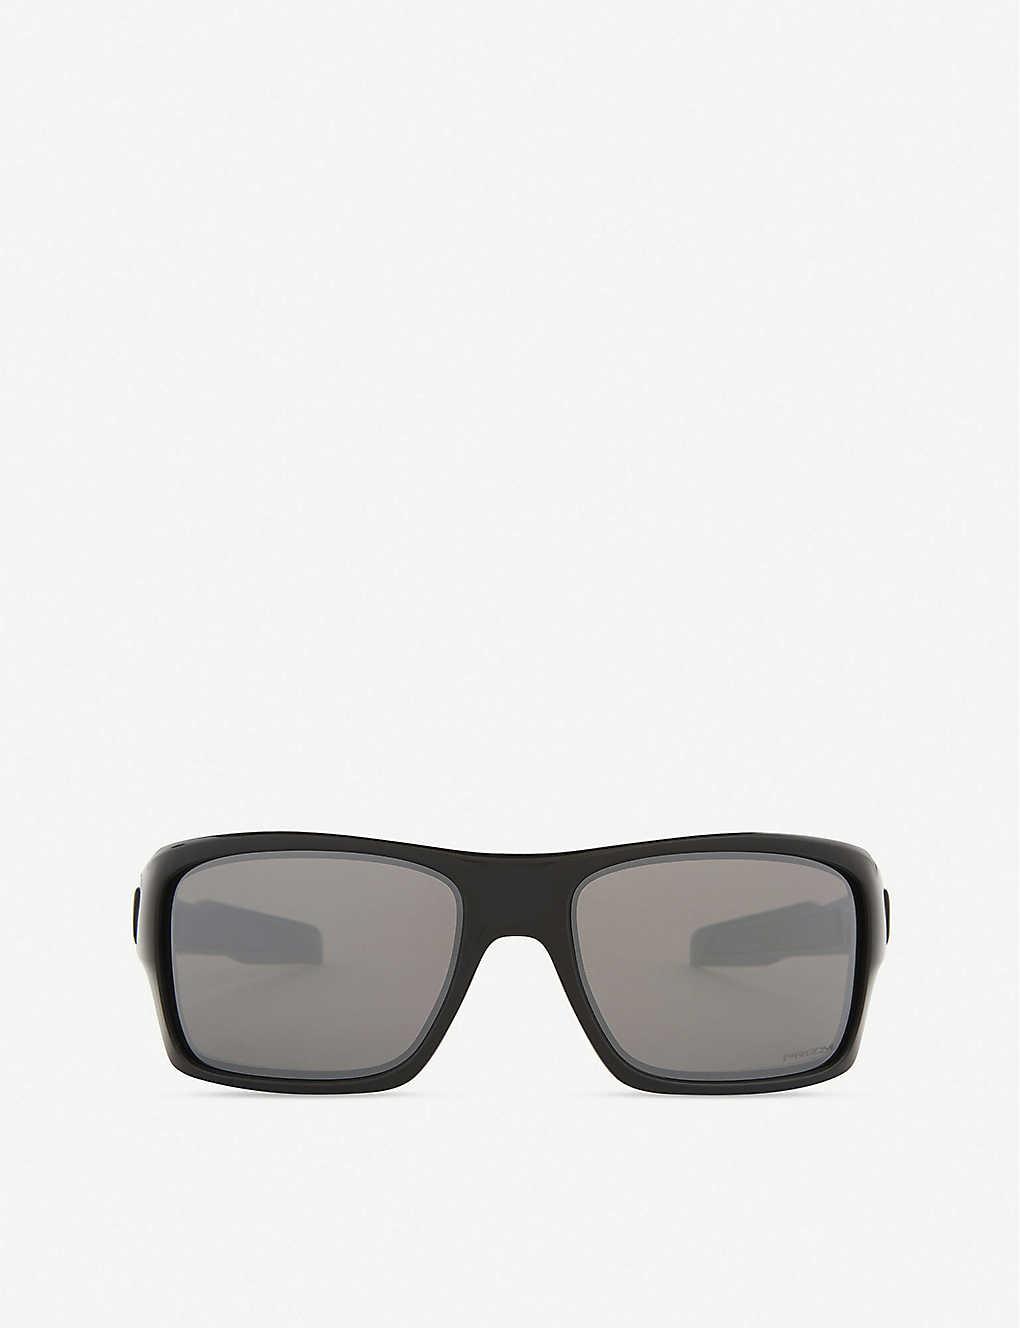 d1a7c88866 OAKLEY - OO9263 turbine sunglasses